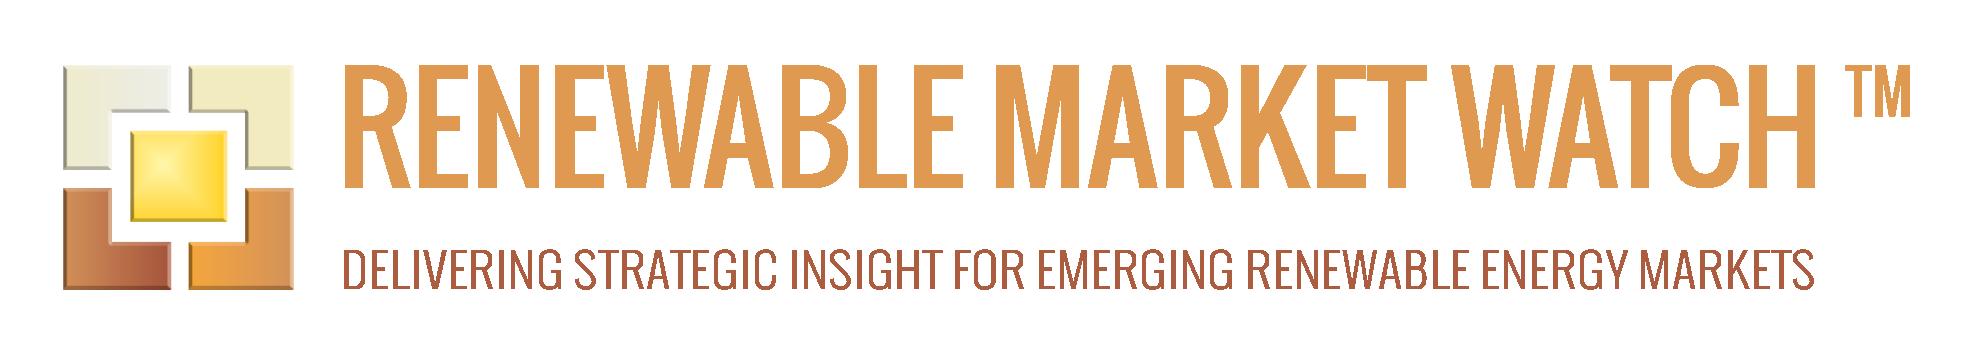 Renewable Market Watch